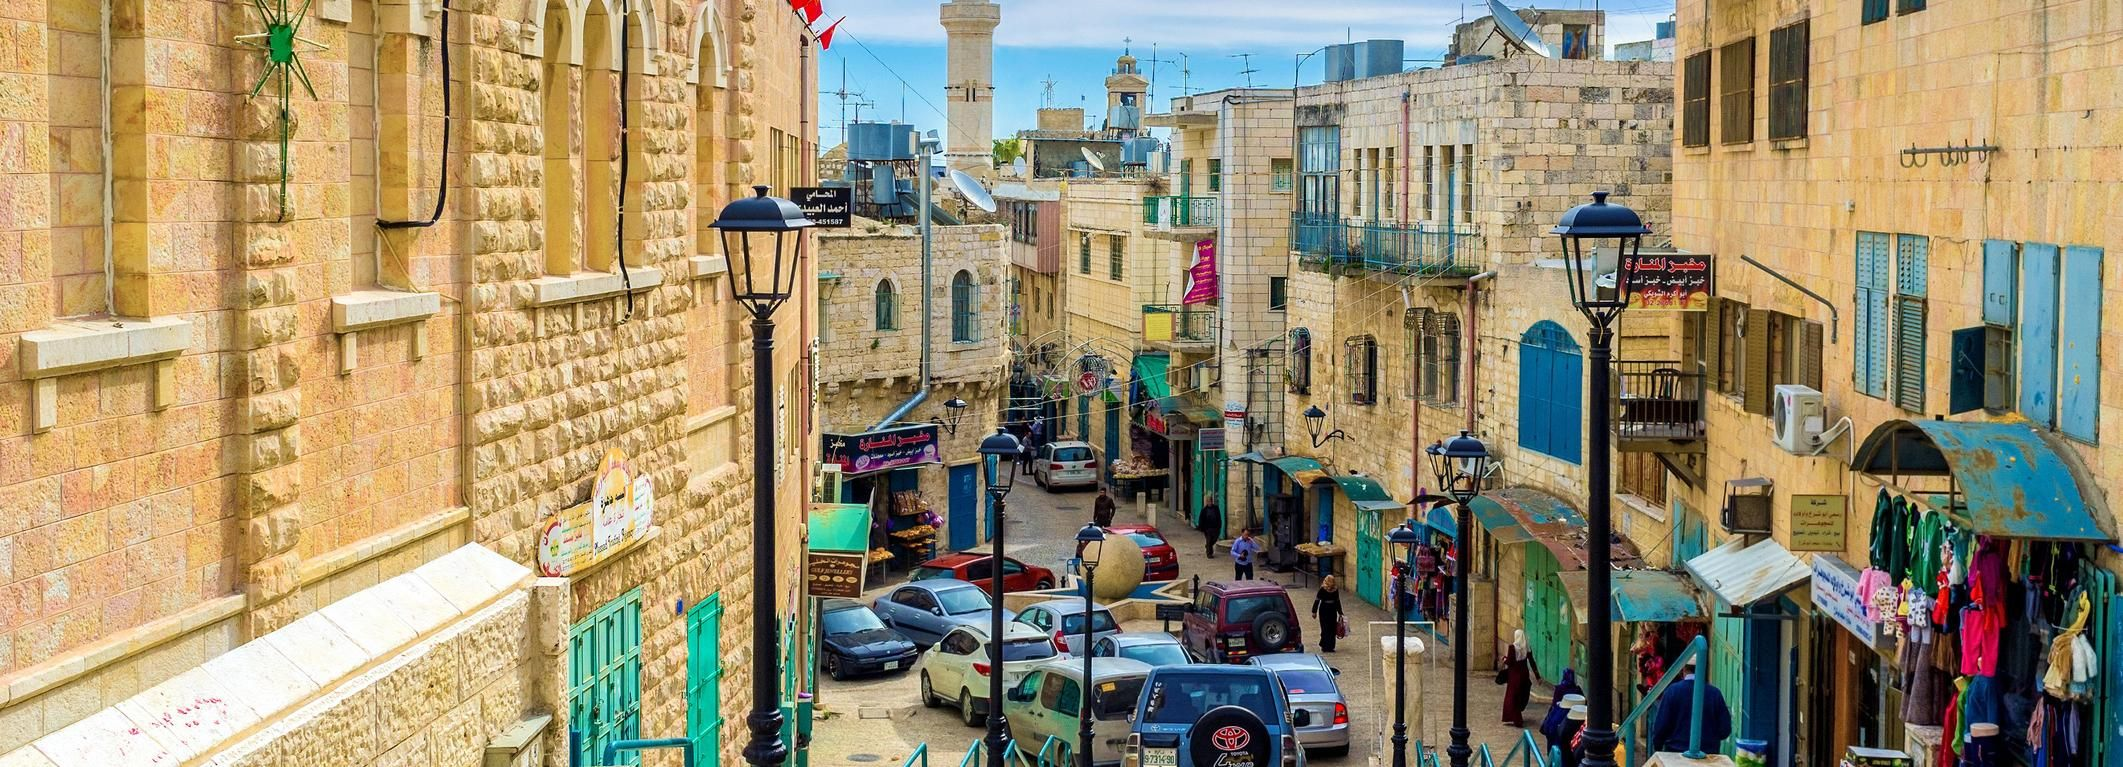 Tel Aviv/Jerusalem: Bethlehem Old City and Dead Sea